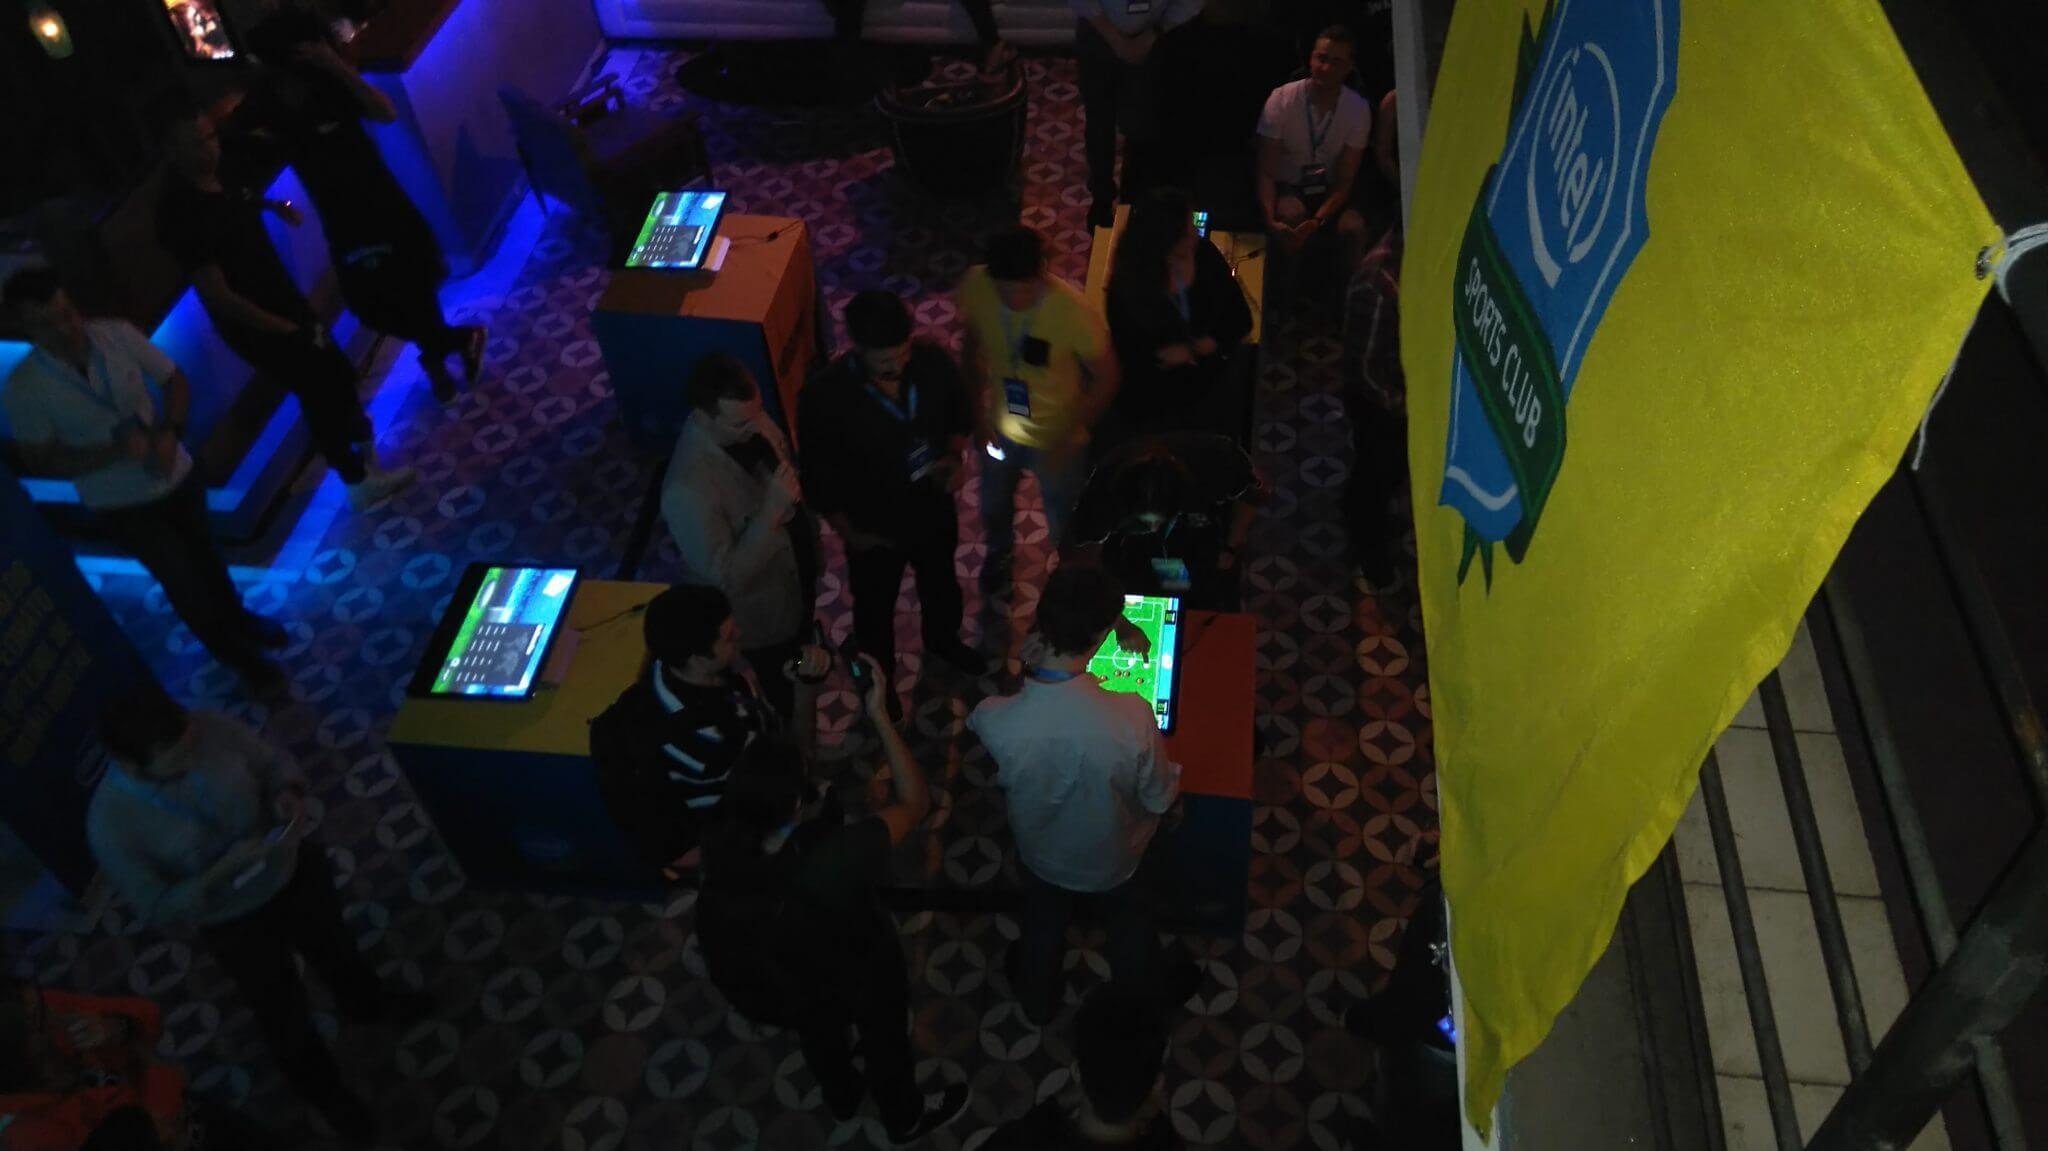 smt-Intel-Evento (7)